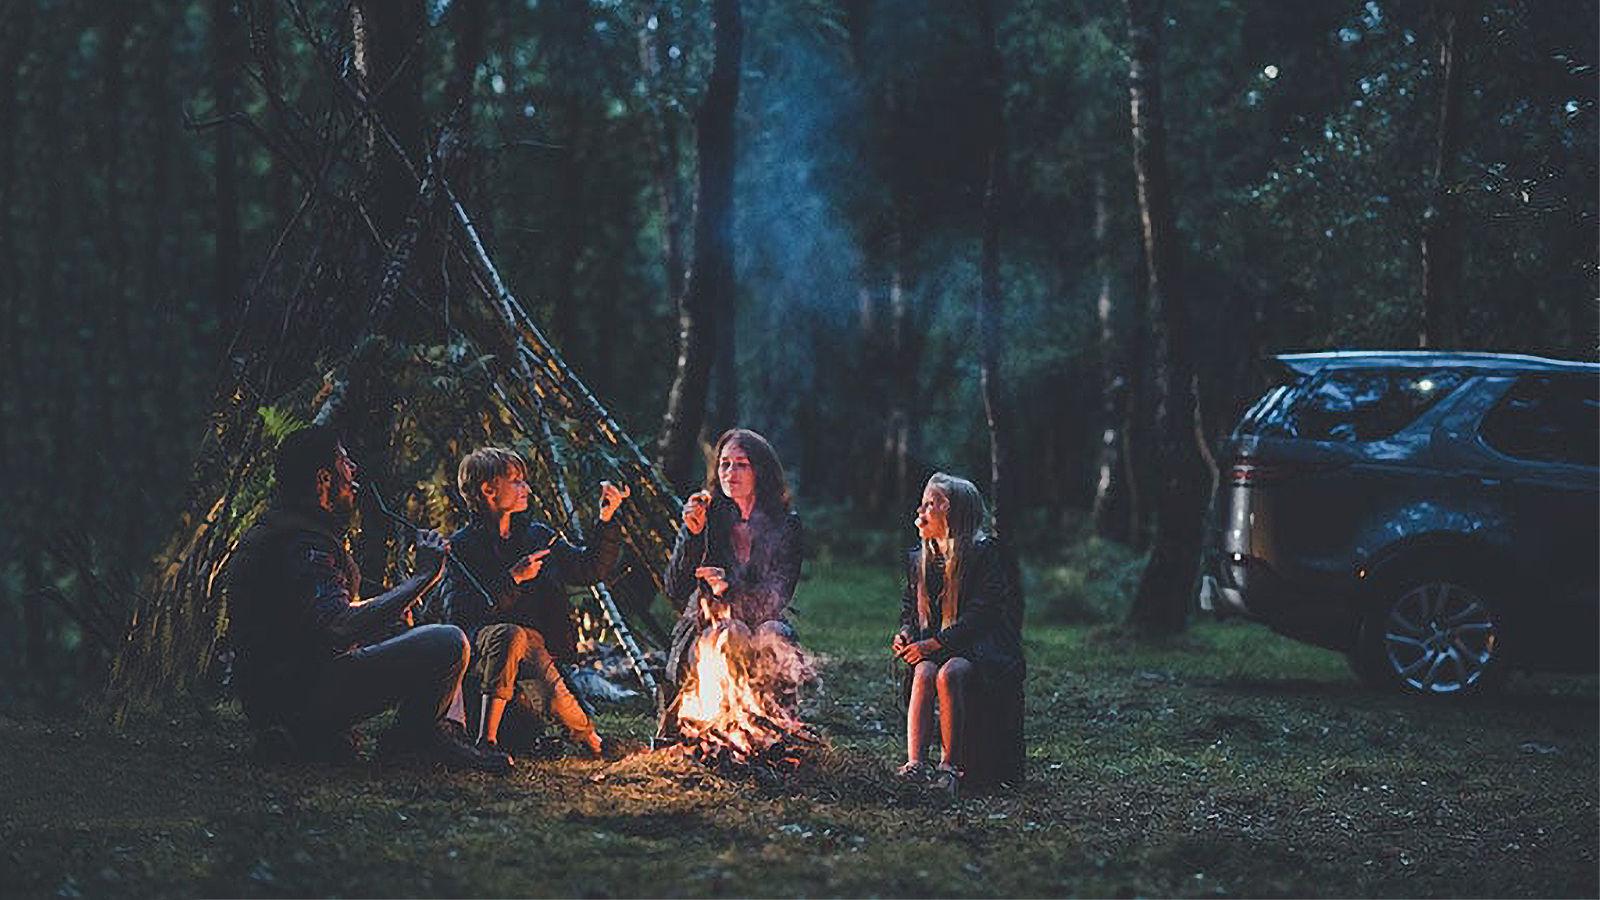 Kamp yapan aile 2